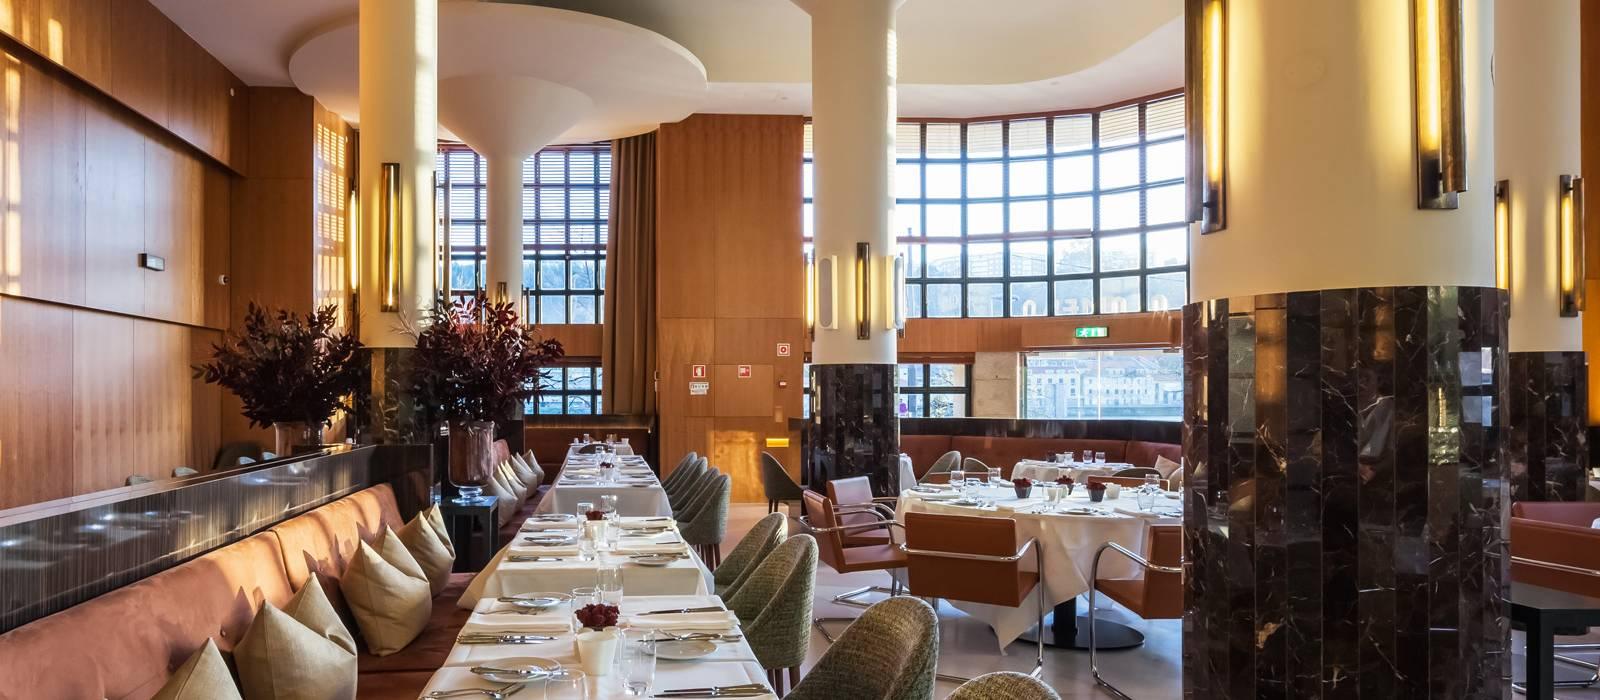 Services Hotel Porto - Vincci Hoteles - Restaurant